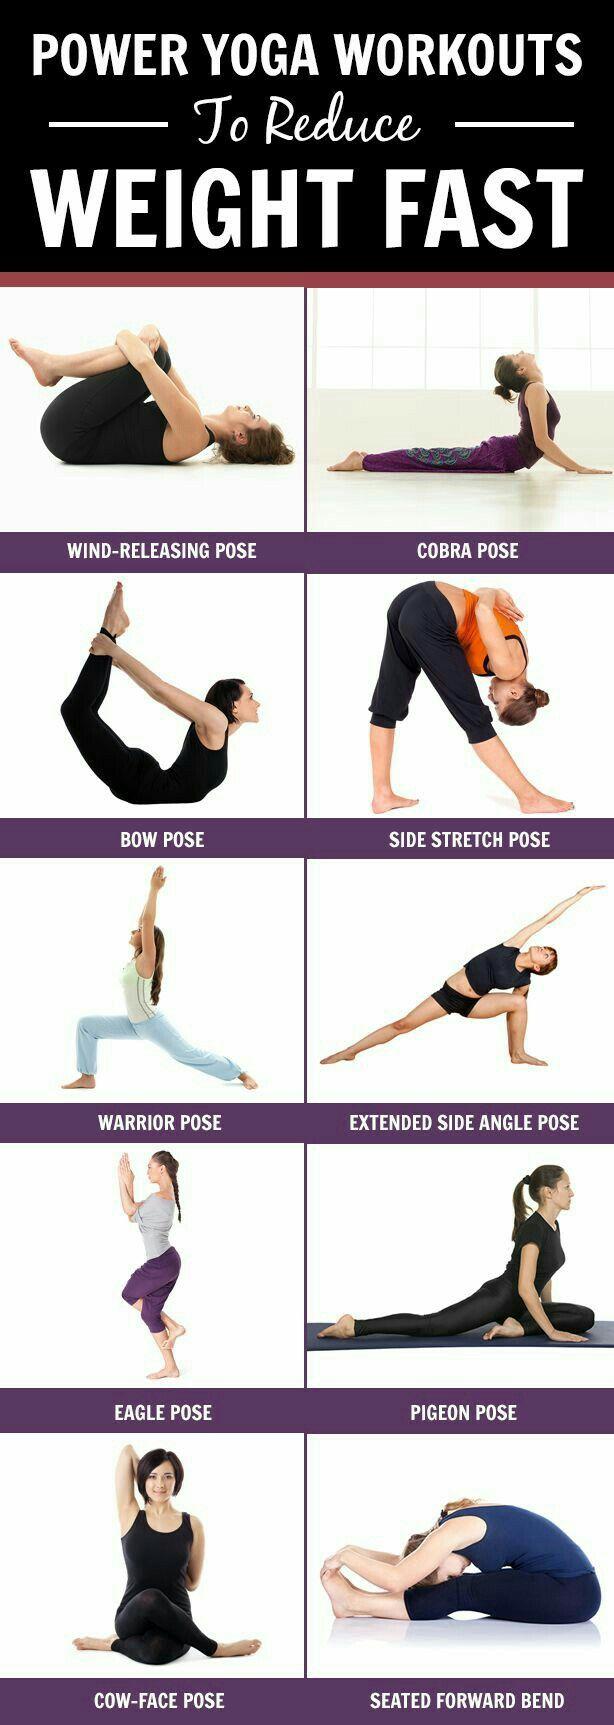 94 best images about Yoga on Pinterest   Yoga poses Yoga ...